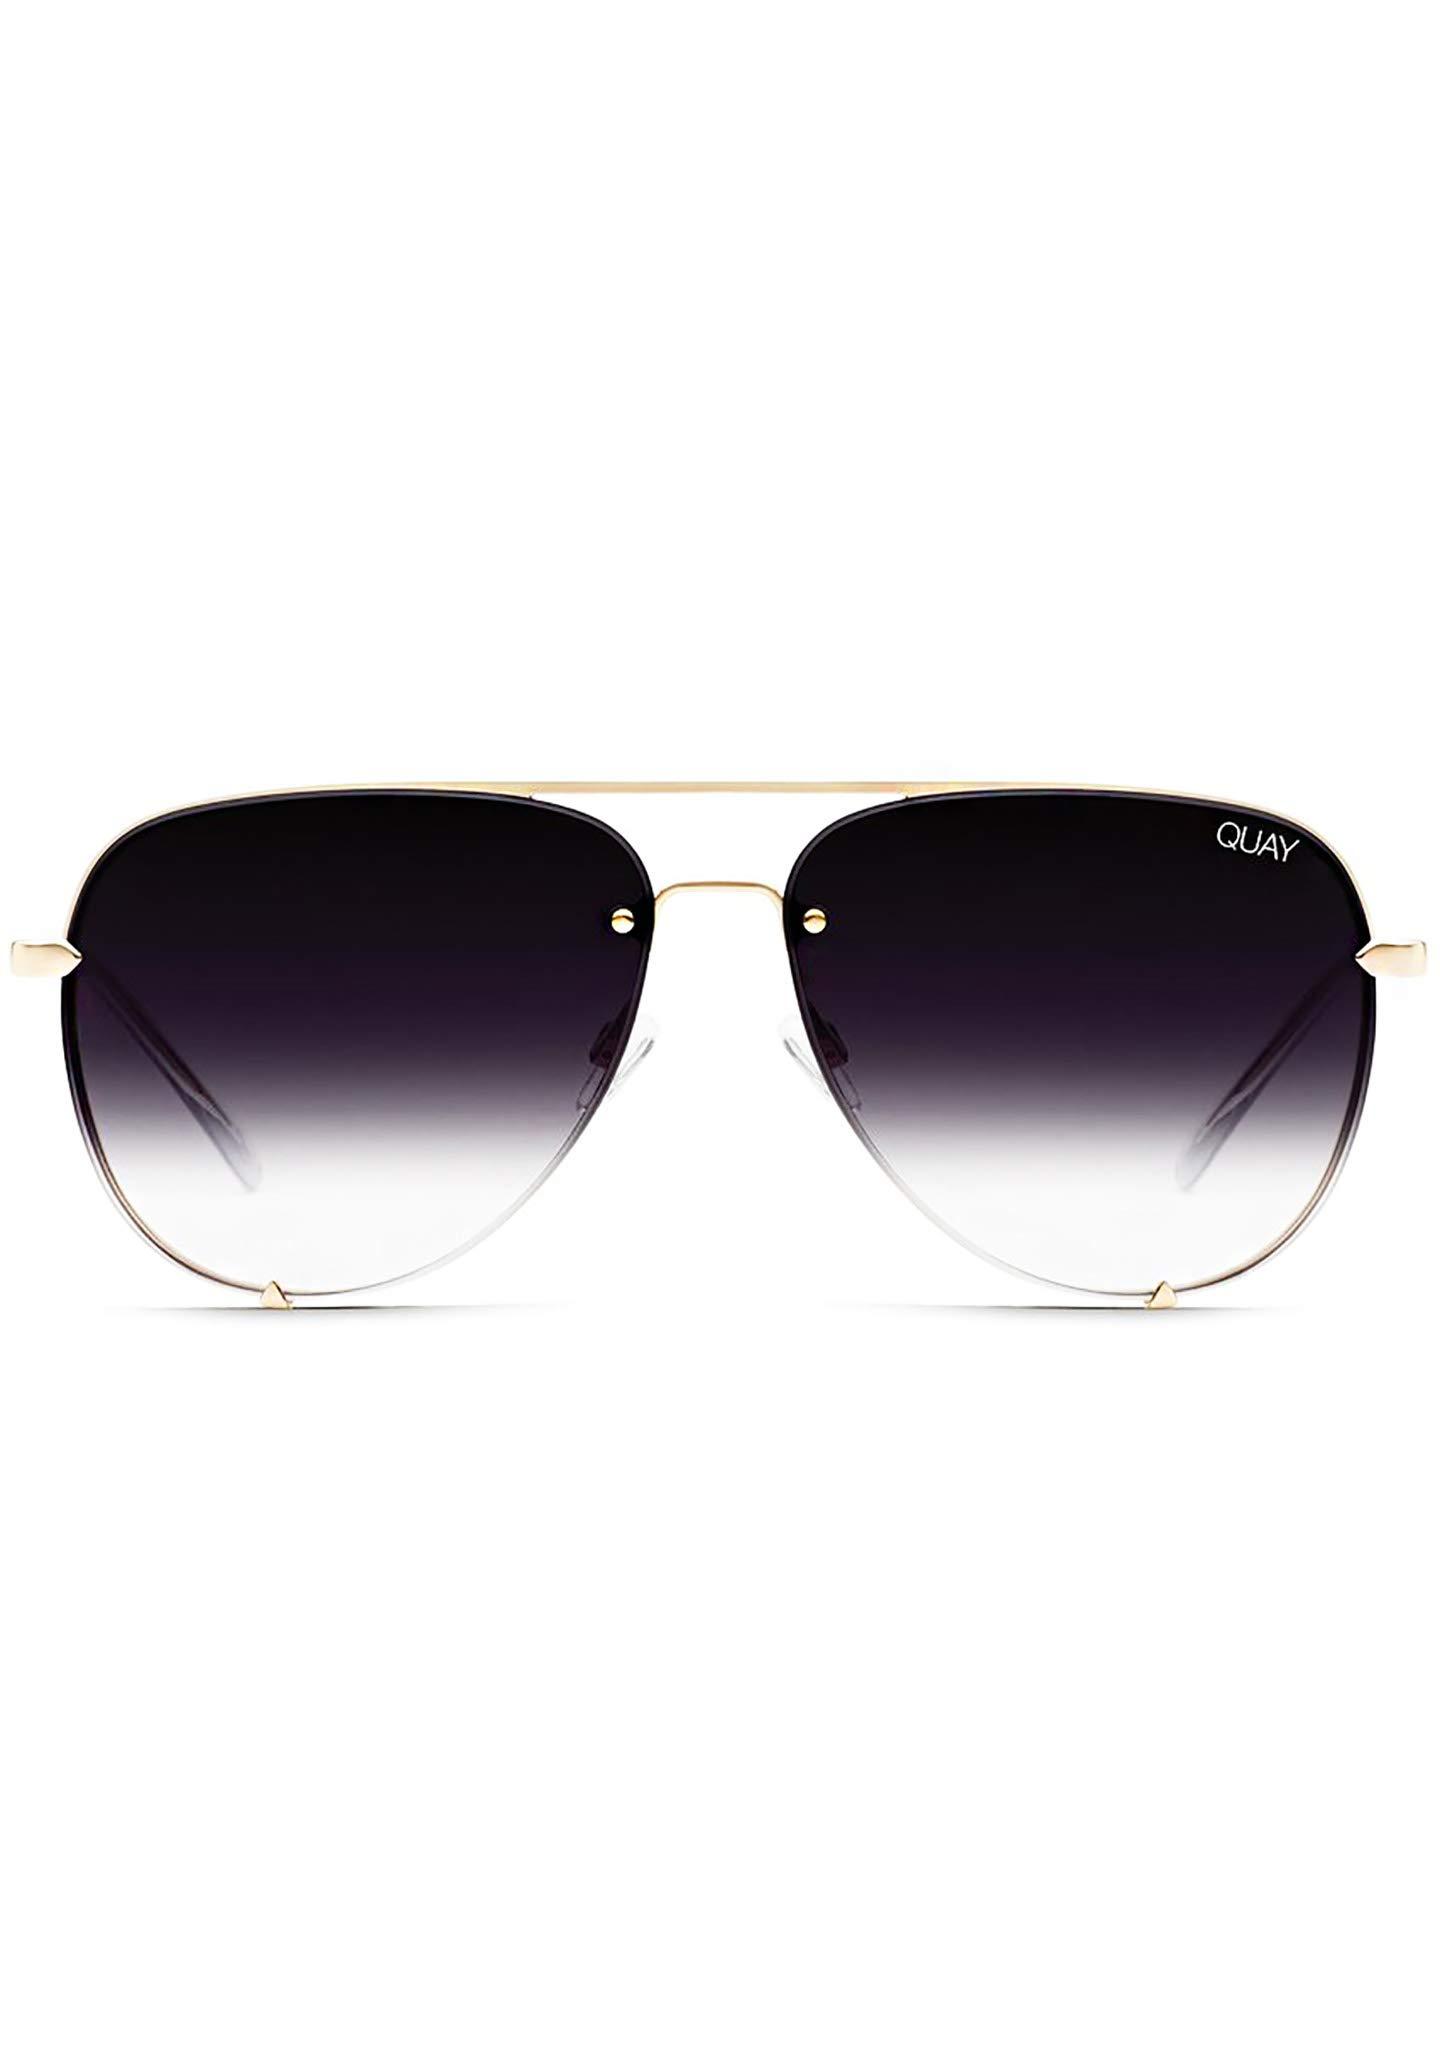 Quay Australia X Desi Perkins HIGH KEY RIMLESS Sunglasses in Gold Fade, Womens, One Size